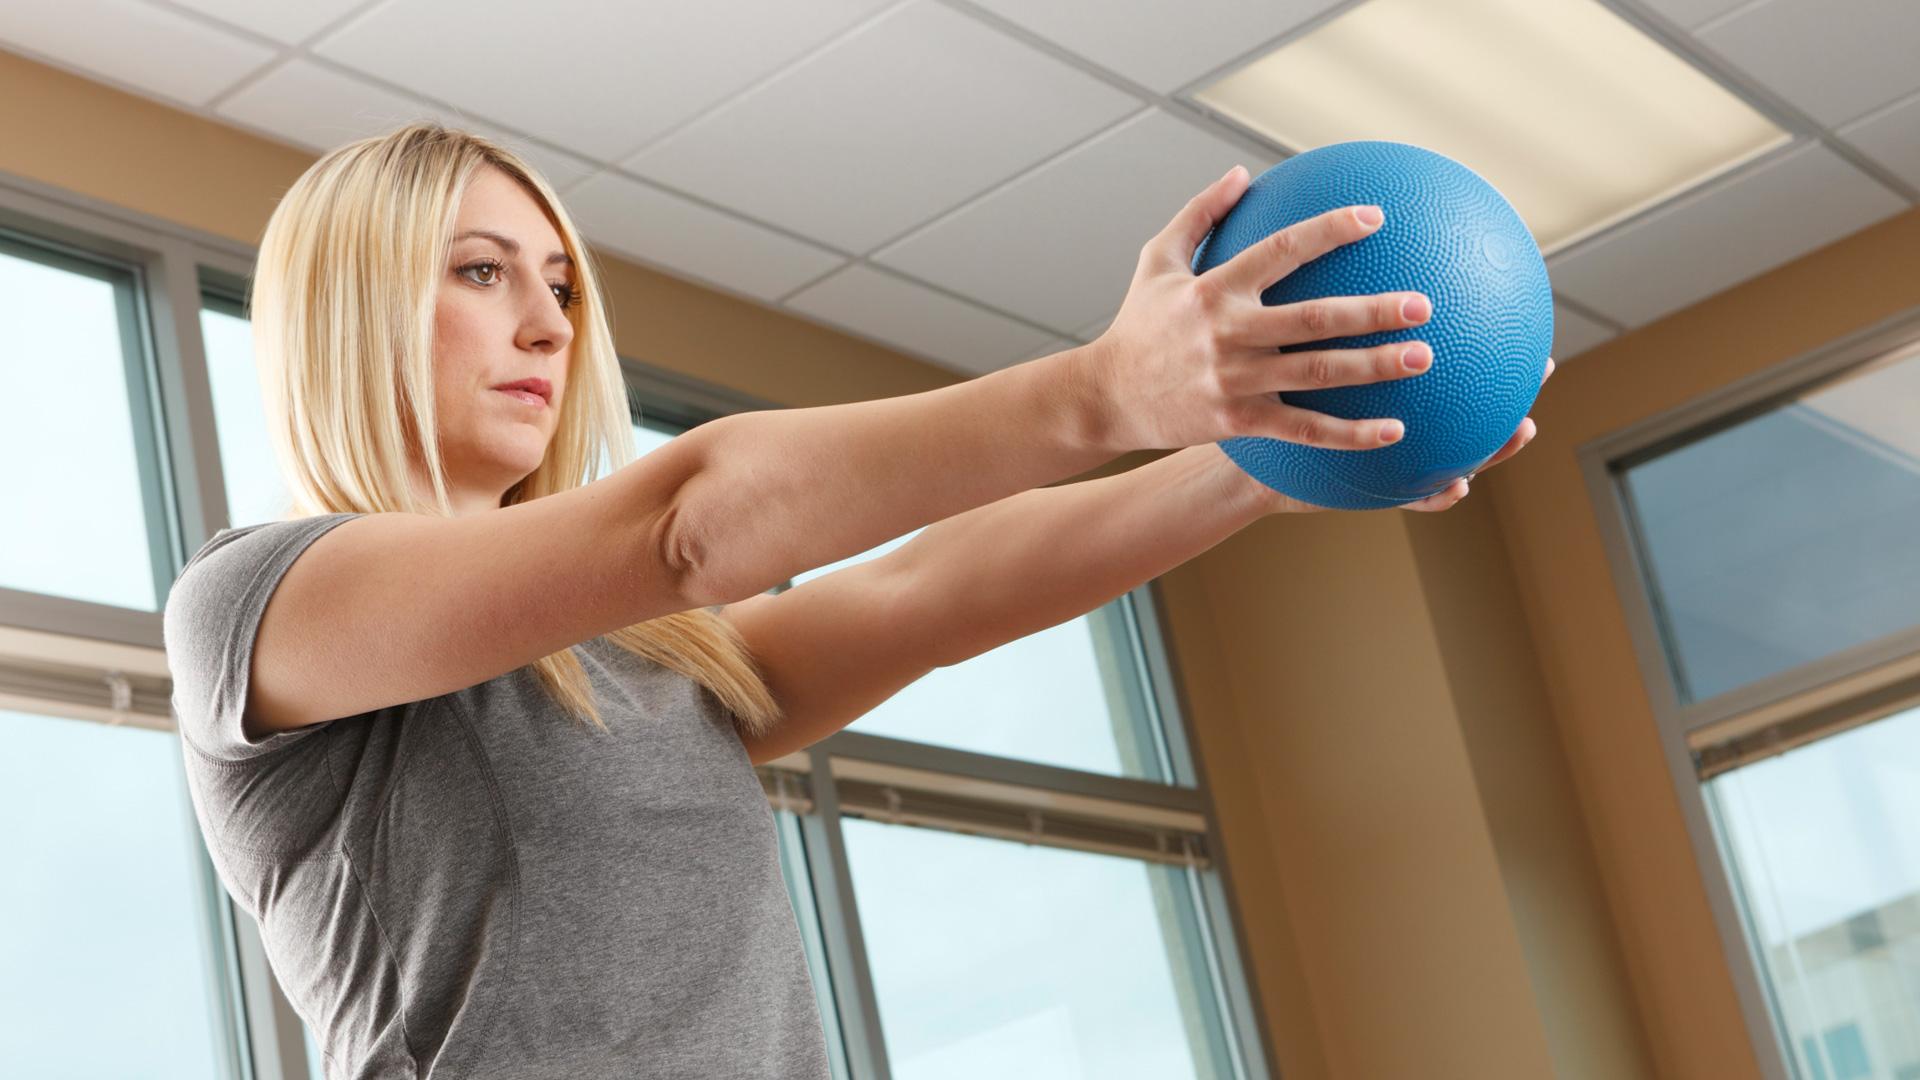 Woman with medicine ball